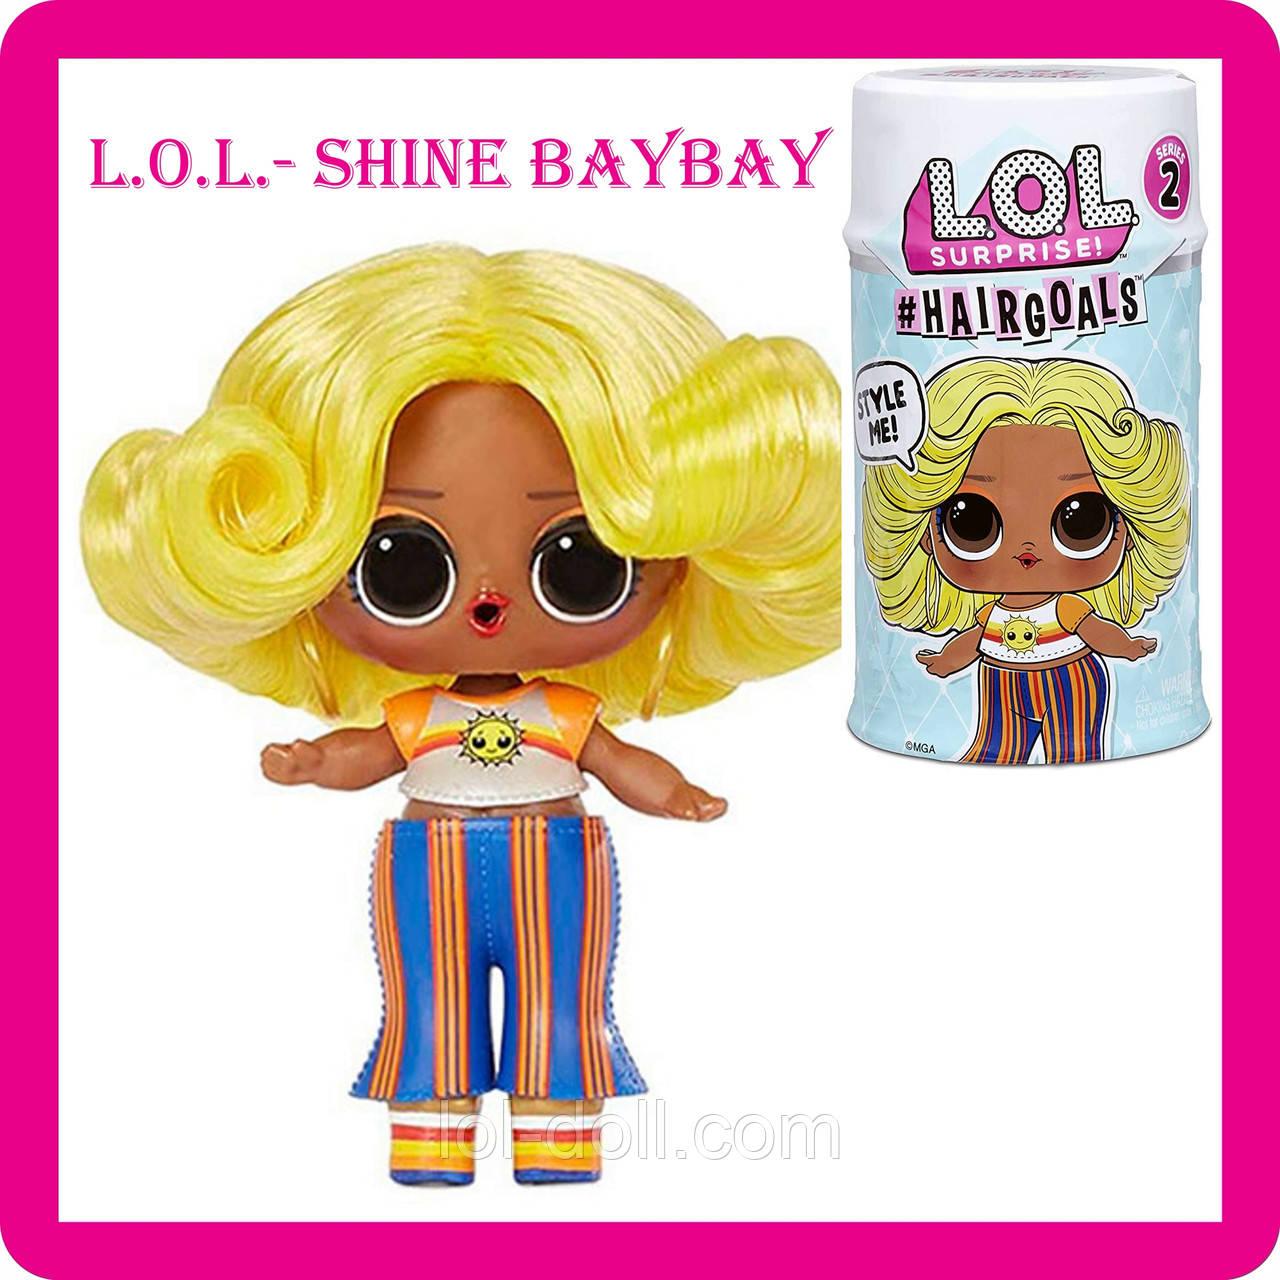 Кукла ЛОЛ Shine Baybay LOL Surprise Оригинал Hairgoals 2 серия Хеиргоалс